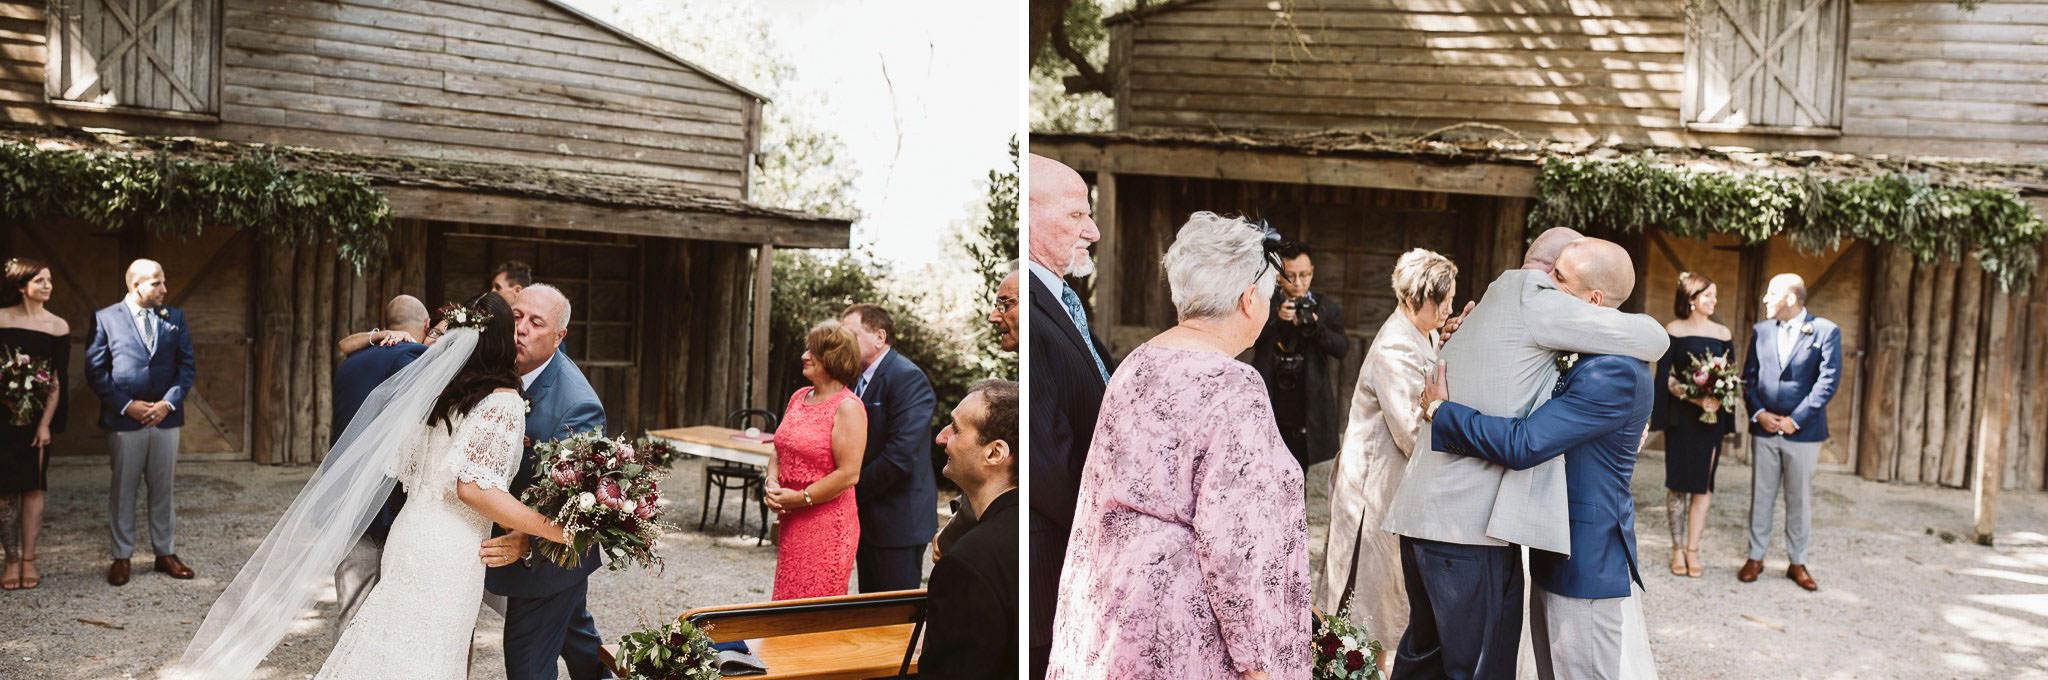 The Farm Yarra Valley Wedding Photography Ashleigh Haase-55.jpg